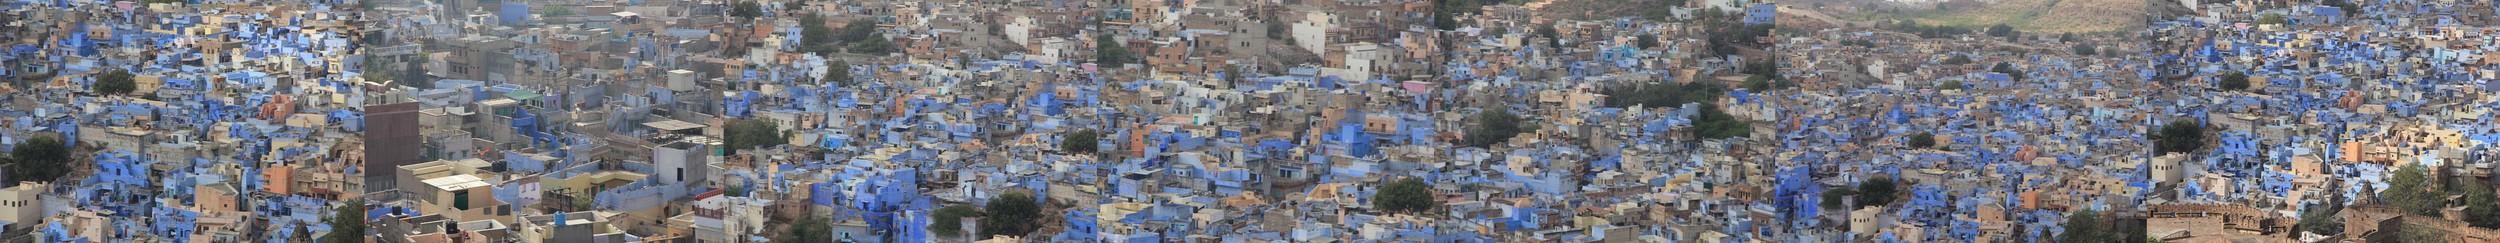 Raw data Blue city